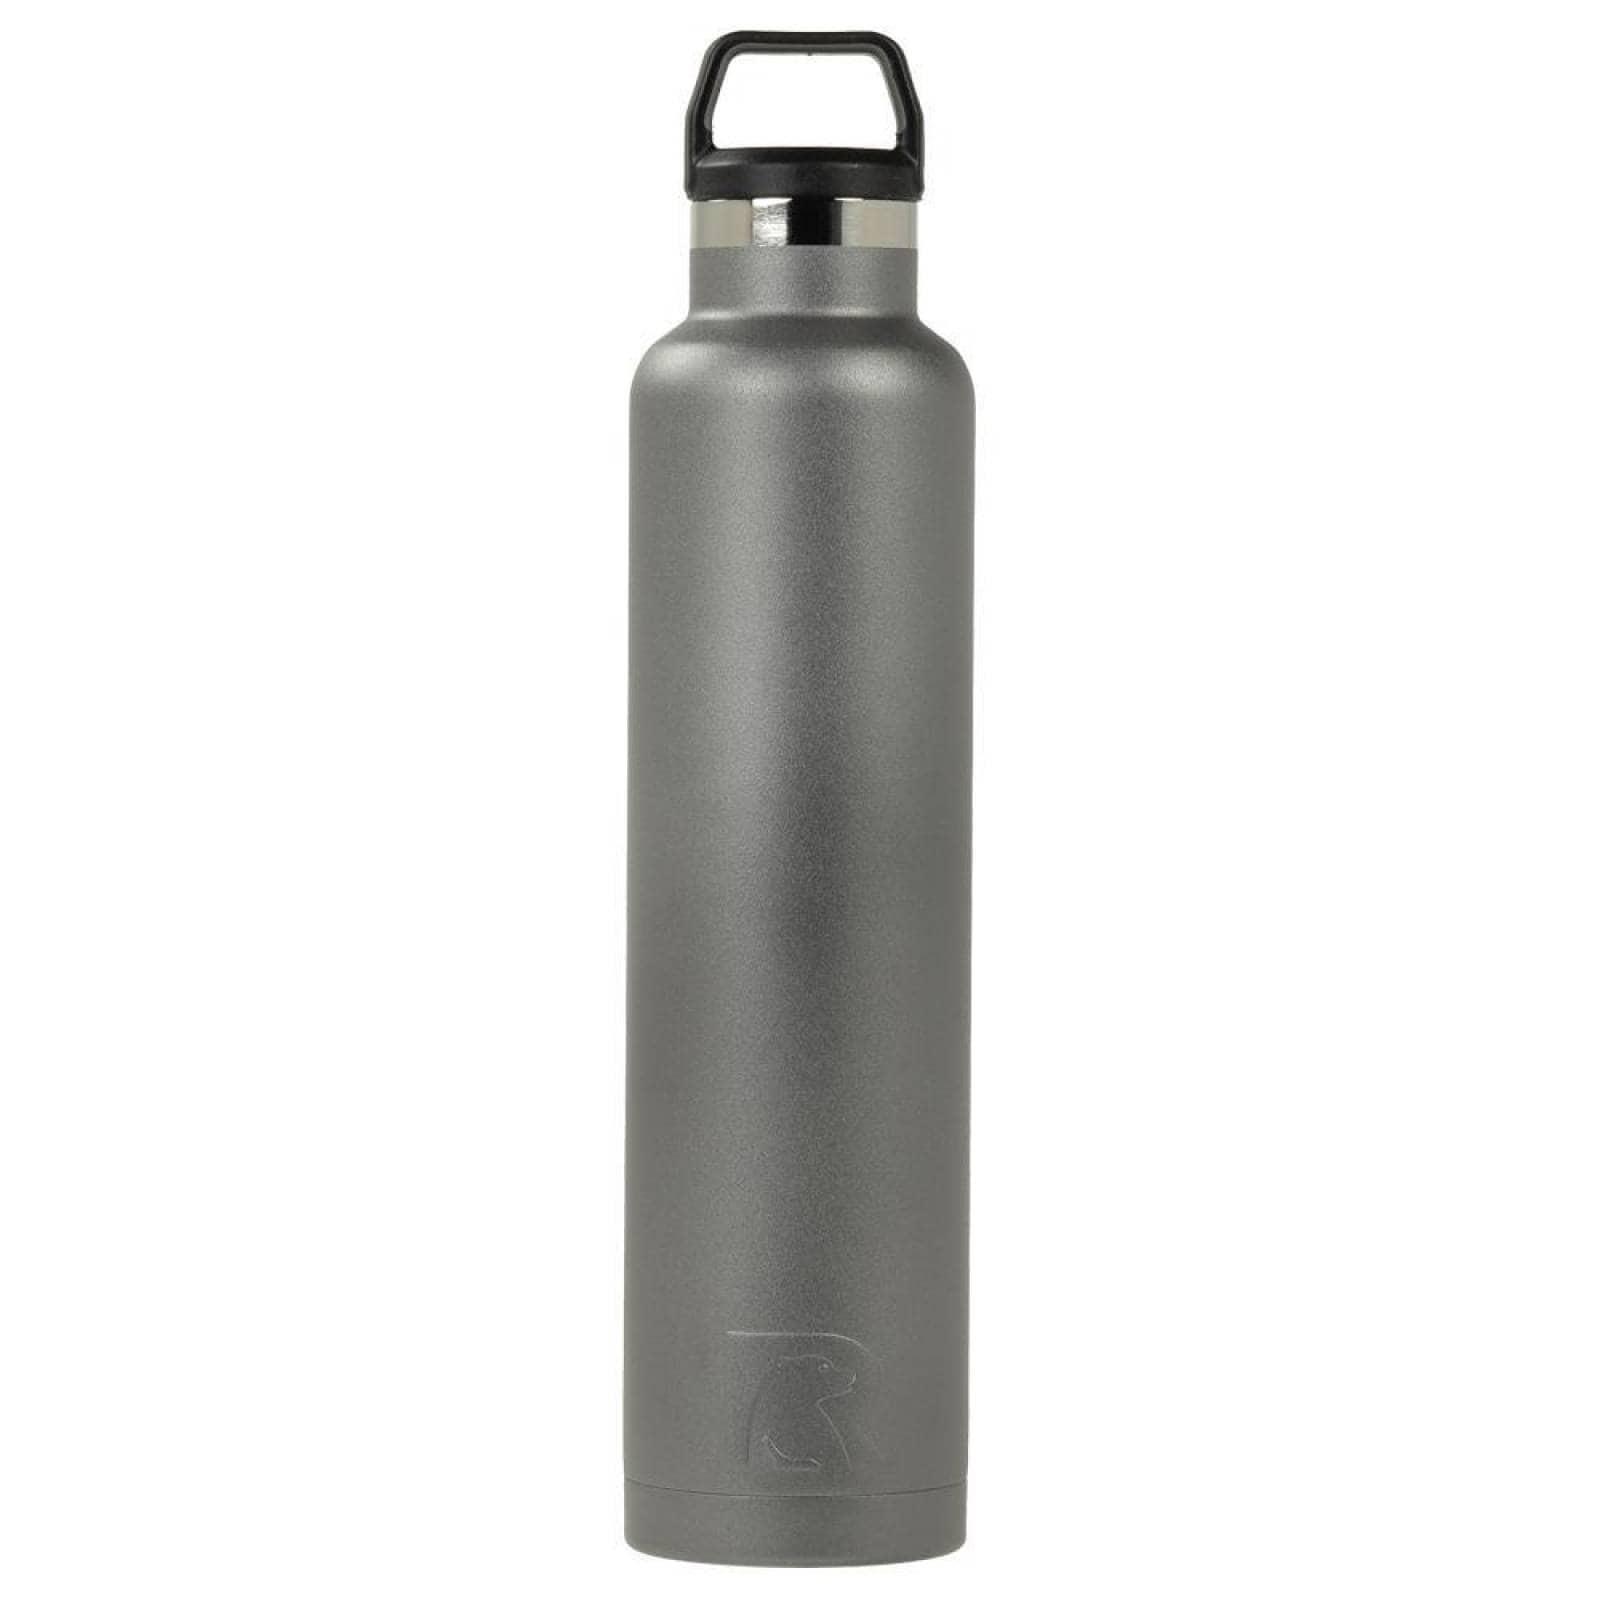 RTIC Water Bottle 26 oz. Graphite Matte   1024